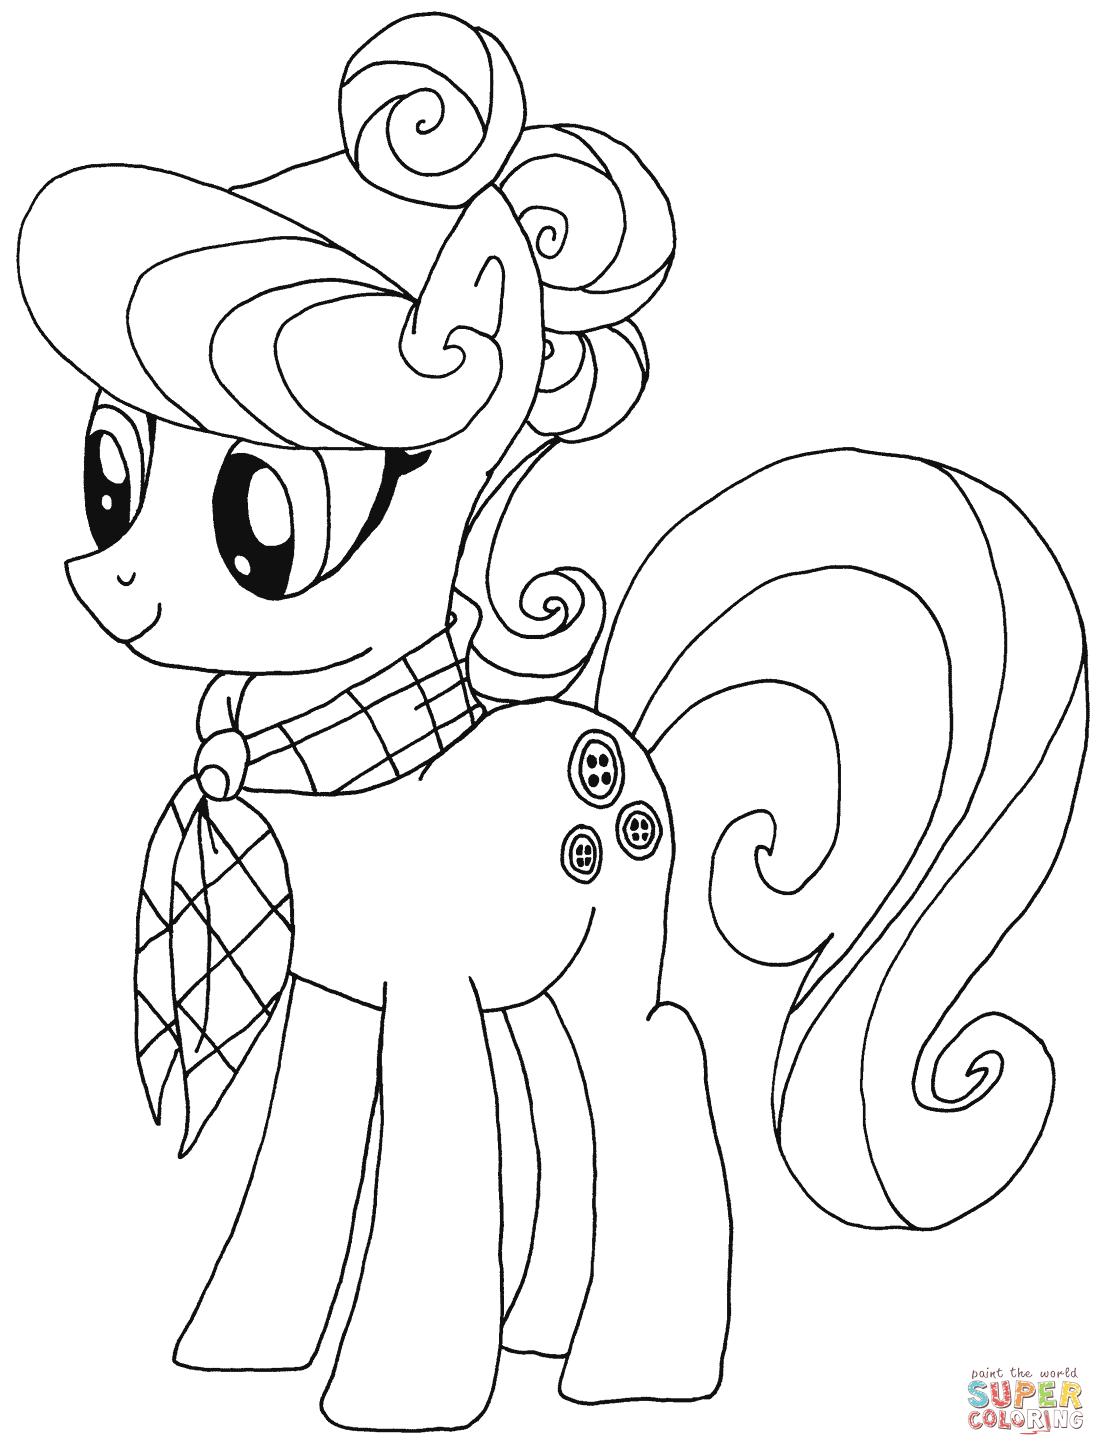 Suri Polomare from My Little Pony